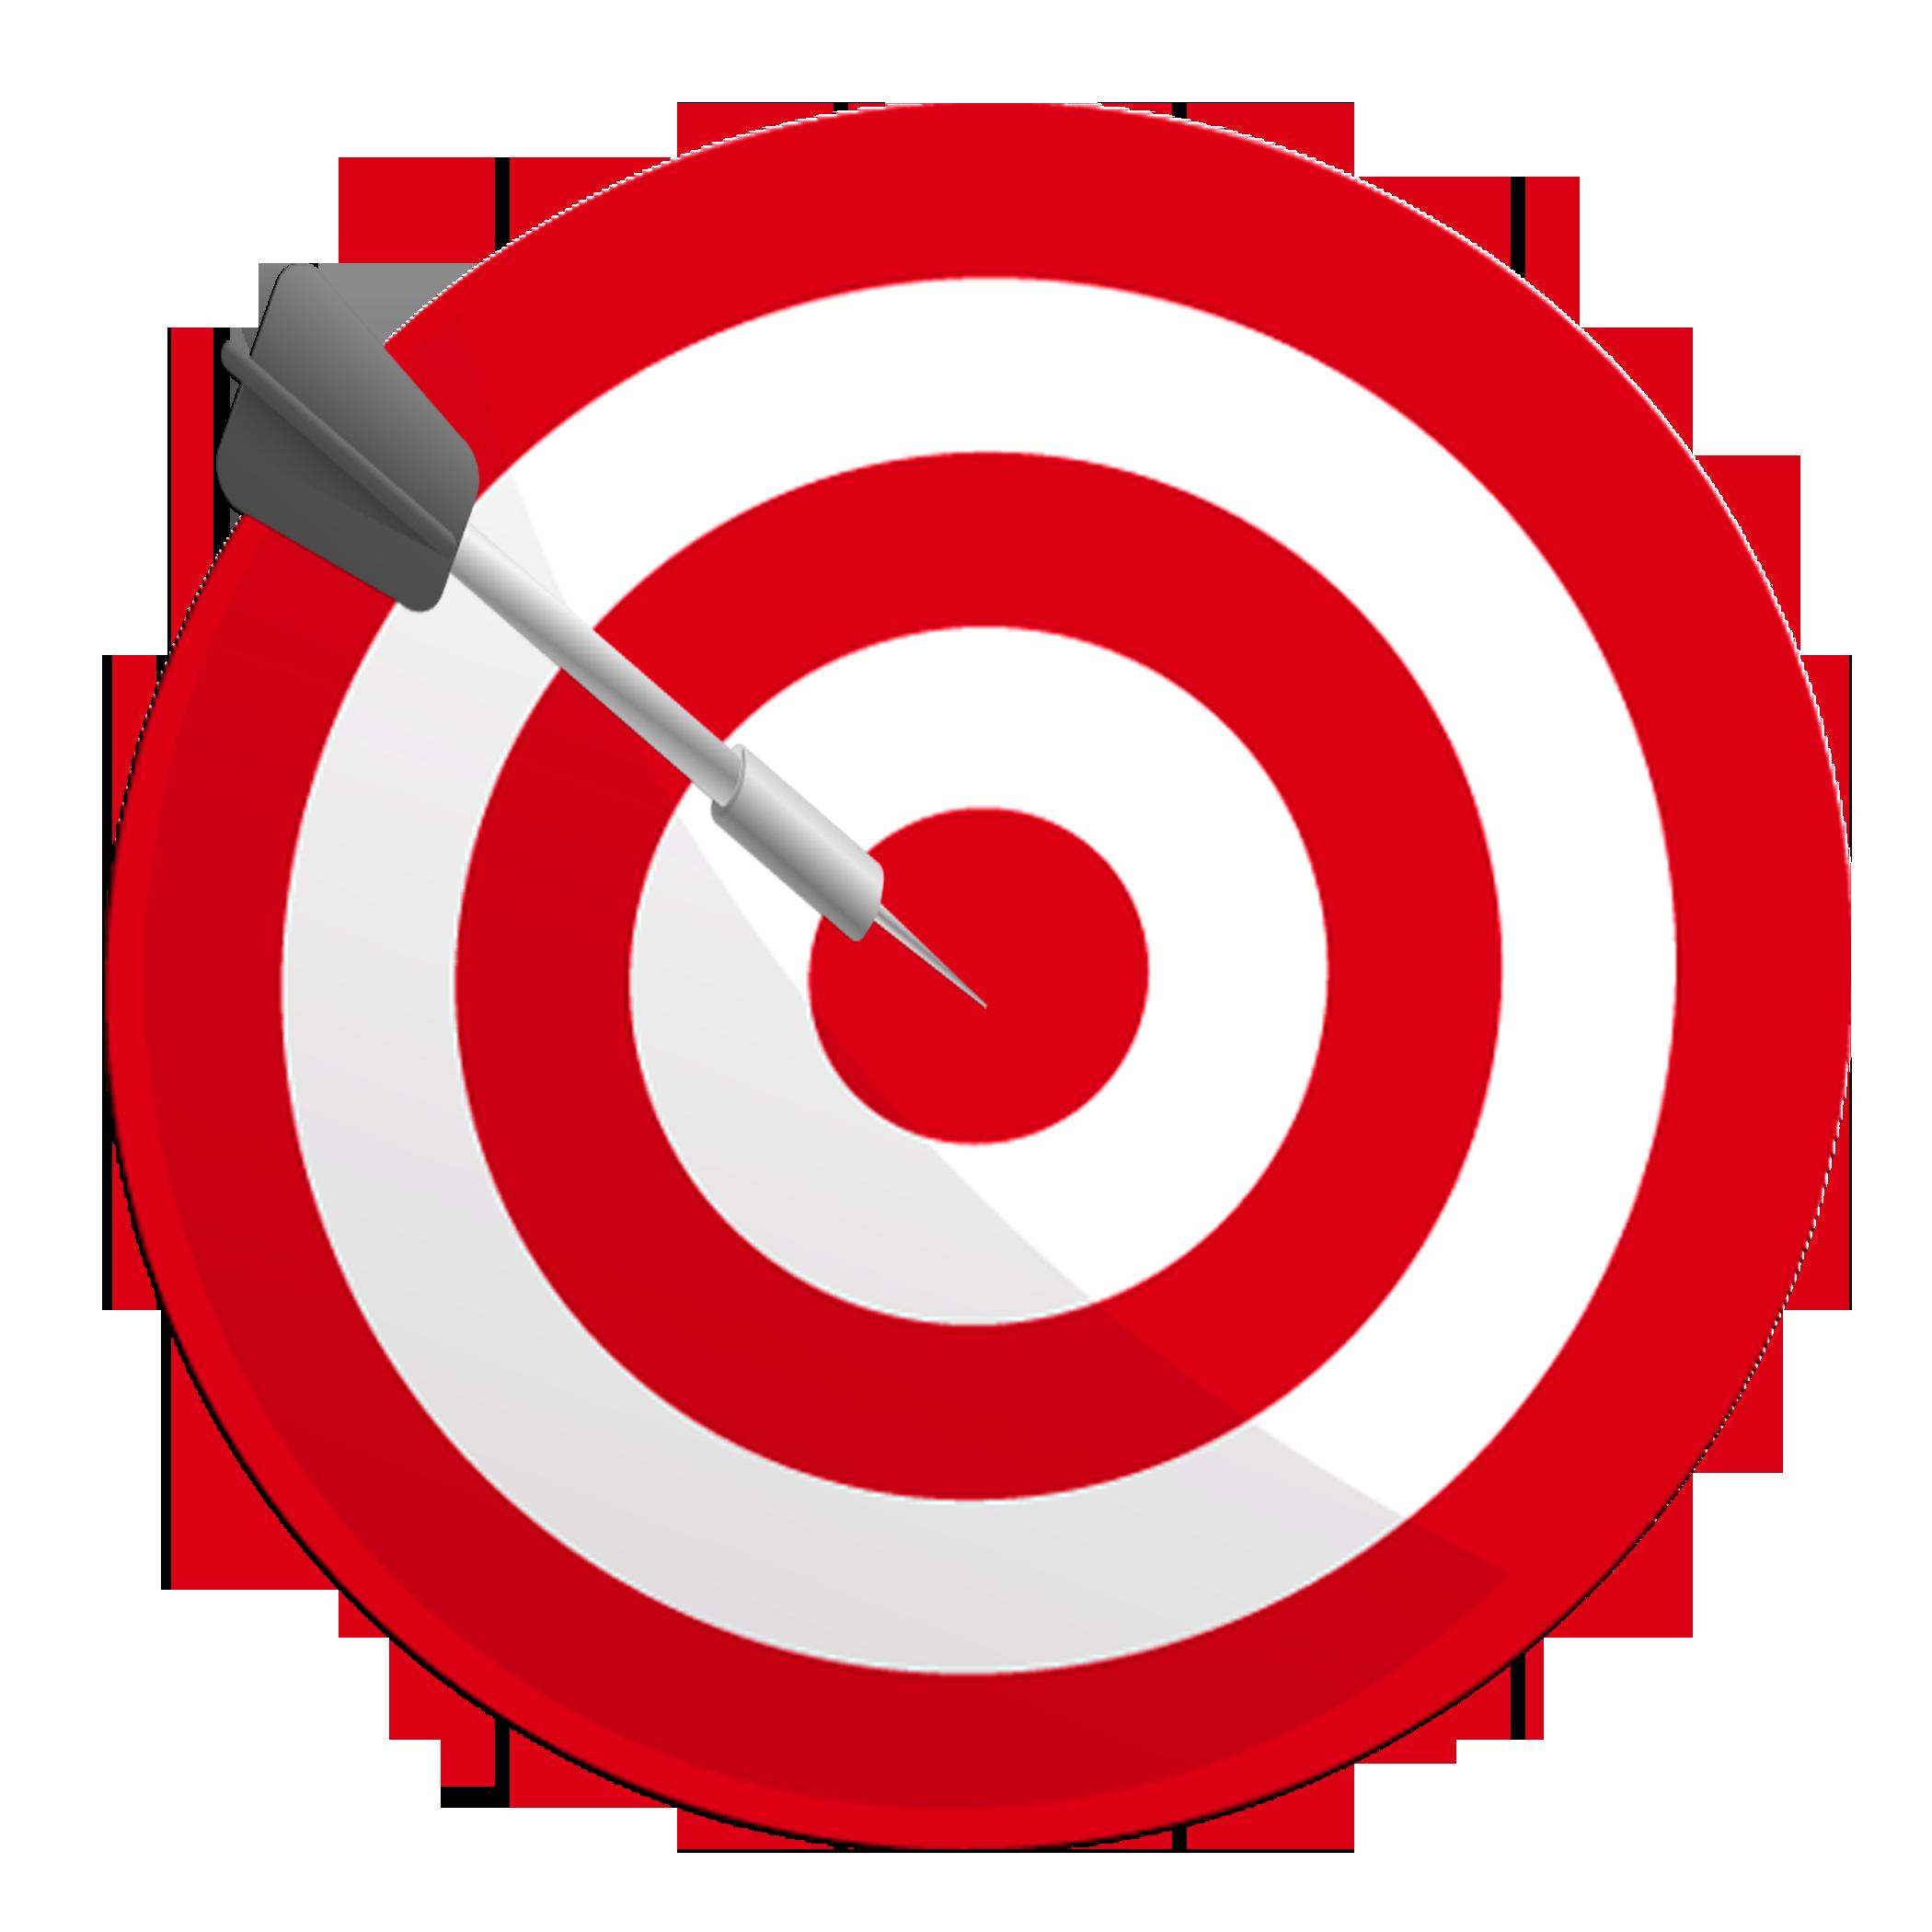 Free PNG Target Bullseye Transparent Target Bullseye.PNG Images.